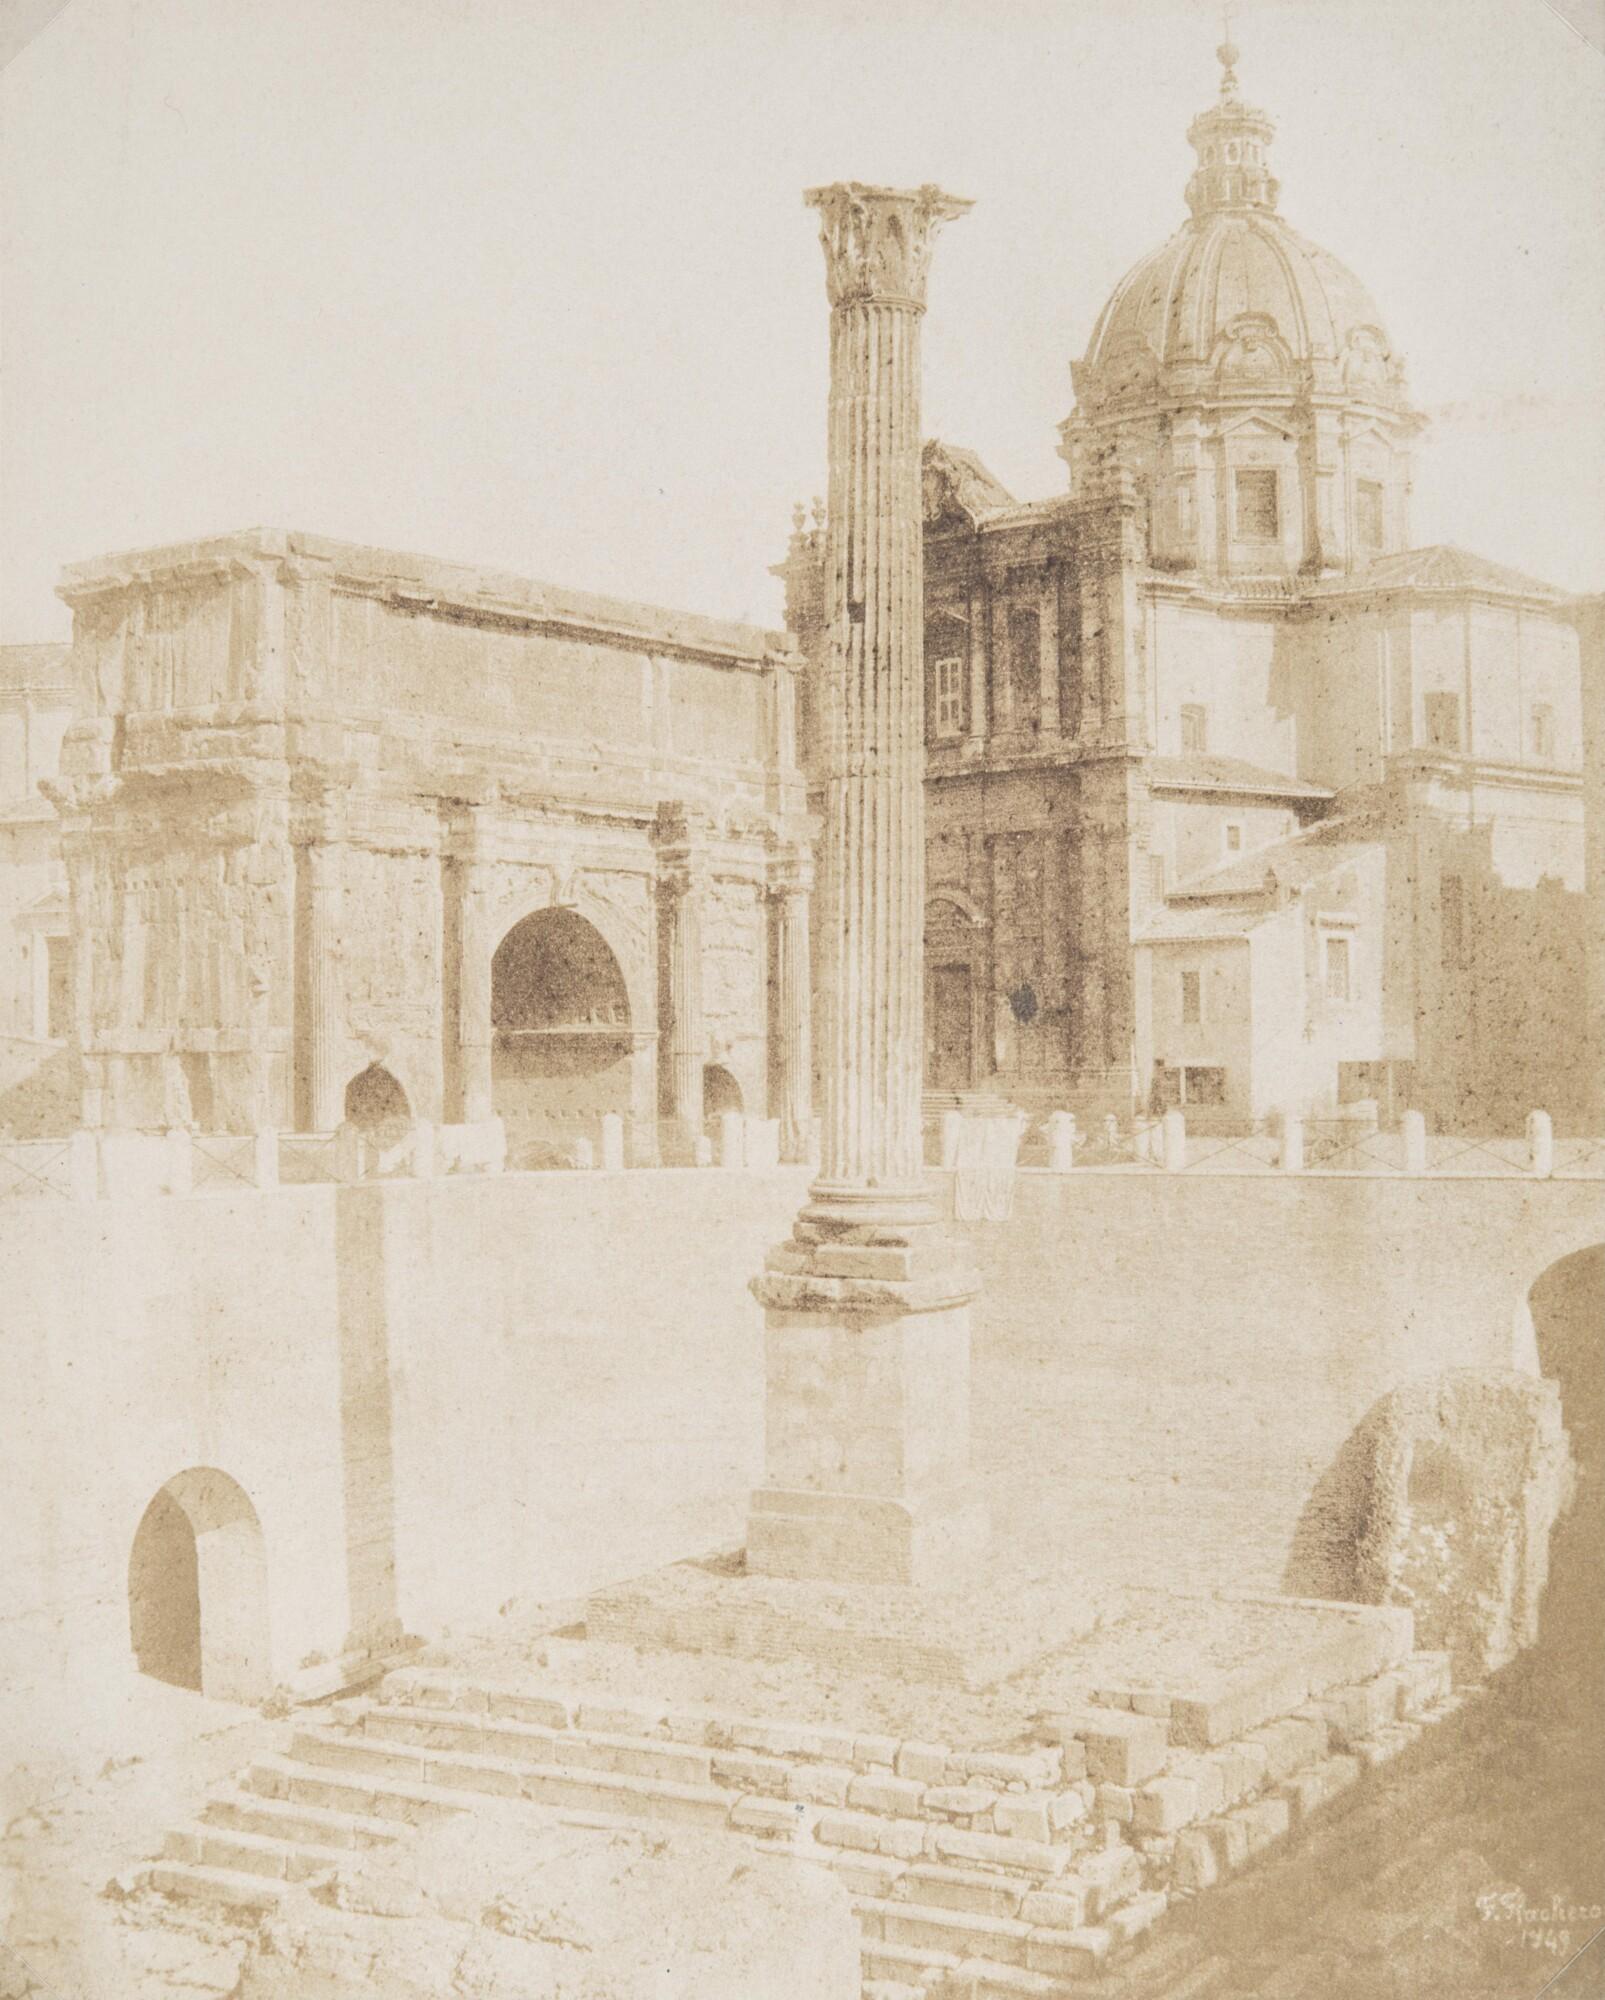 Фредерик Флашерон.  Римский форум,1849 Отпечаток на соленой бумаге